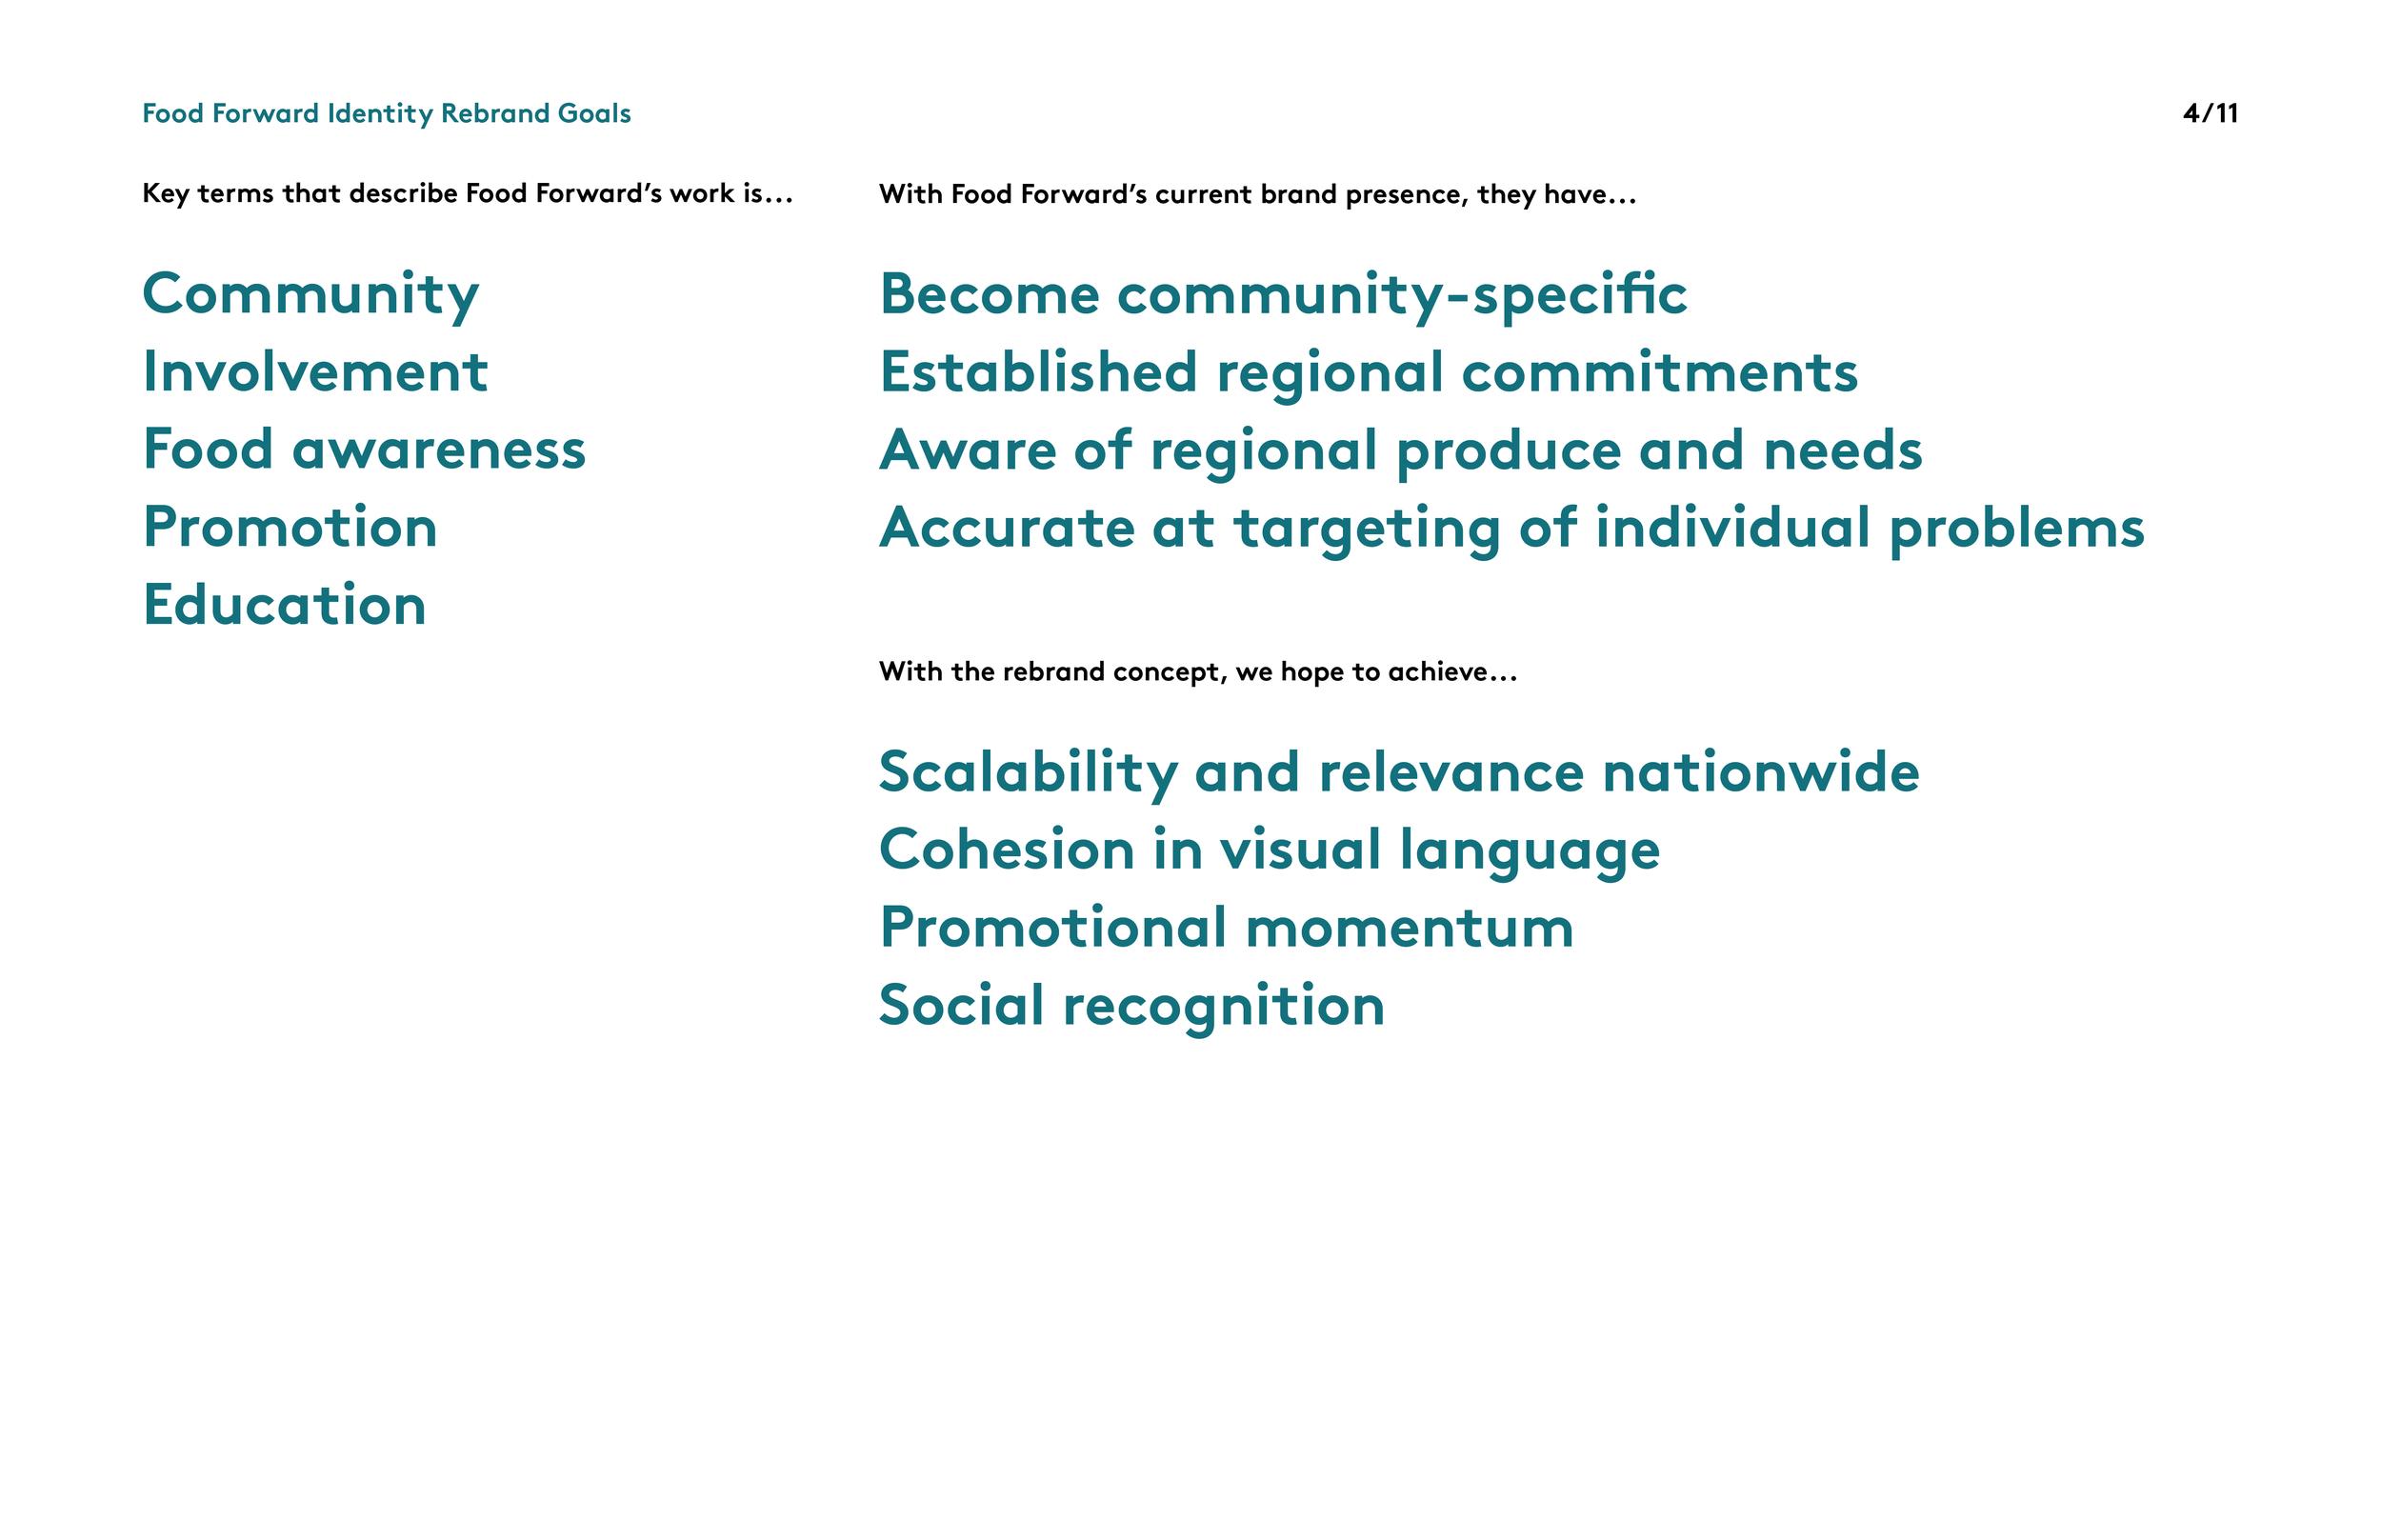 Brand book v2_4. Rebrand statement.png